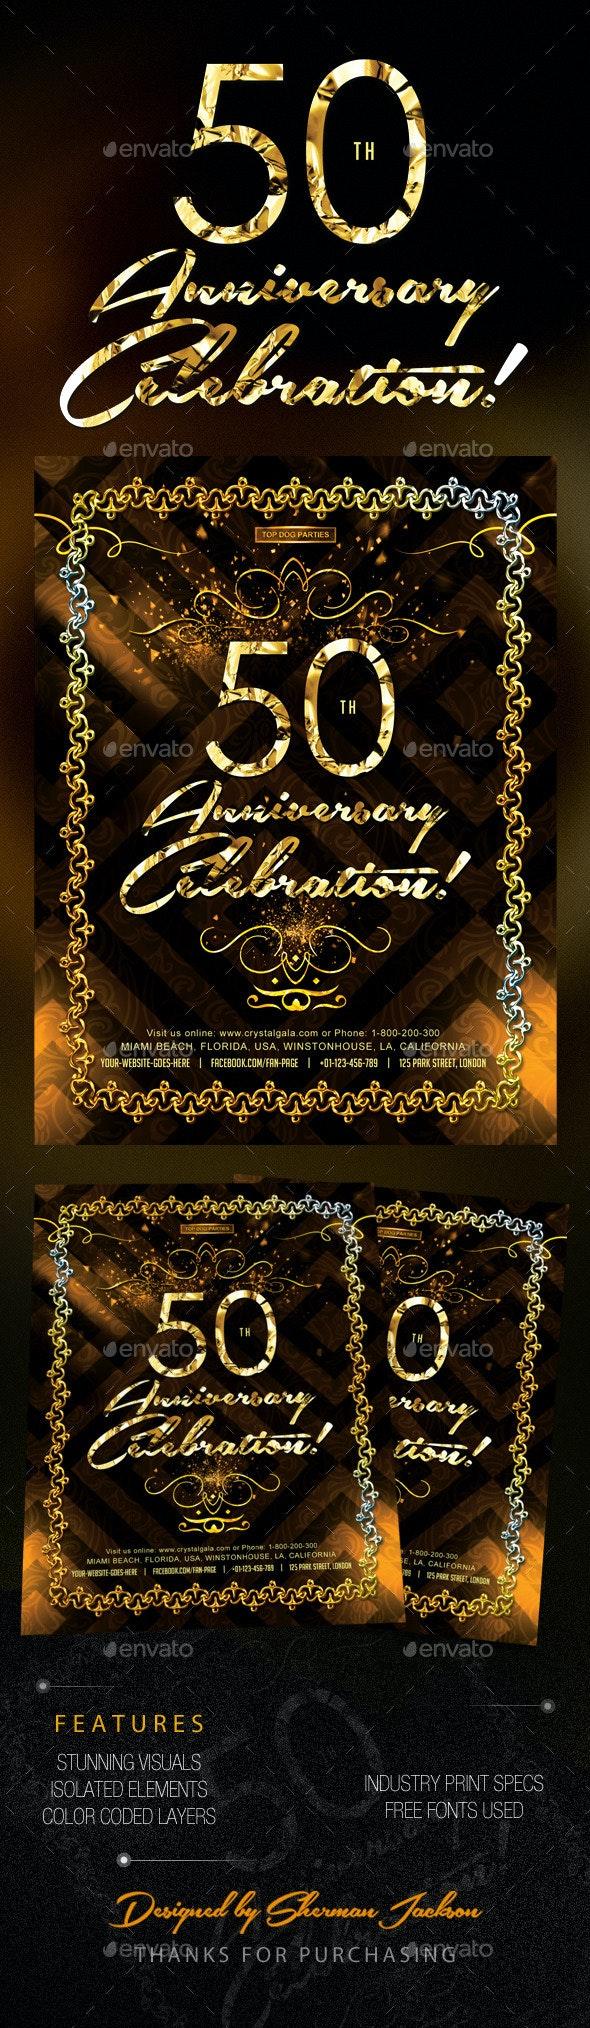 Golden 50th Anniversary & Birthday Celebrations - Invitations Cards & Invites